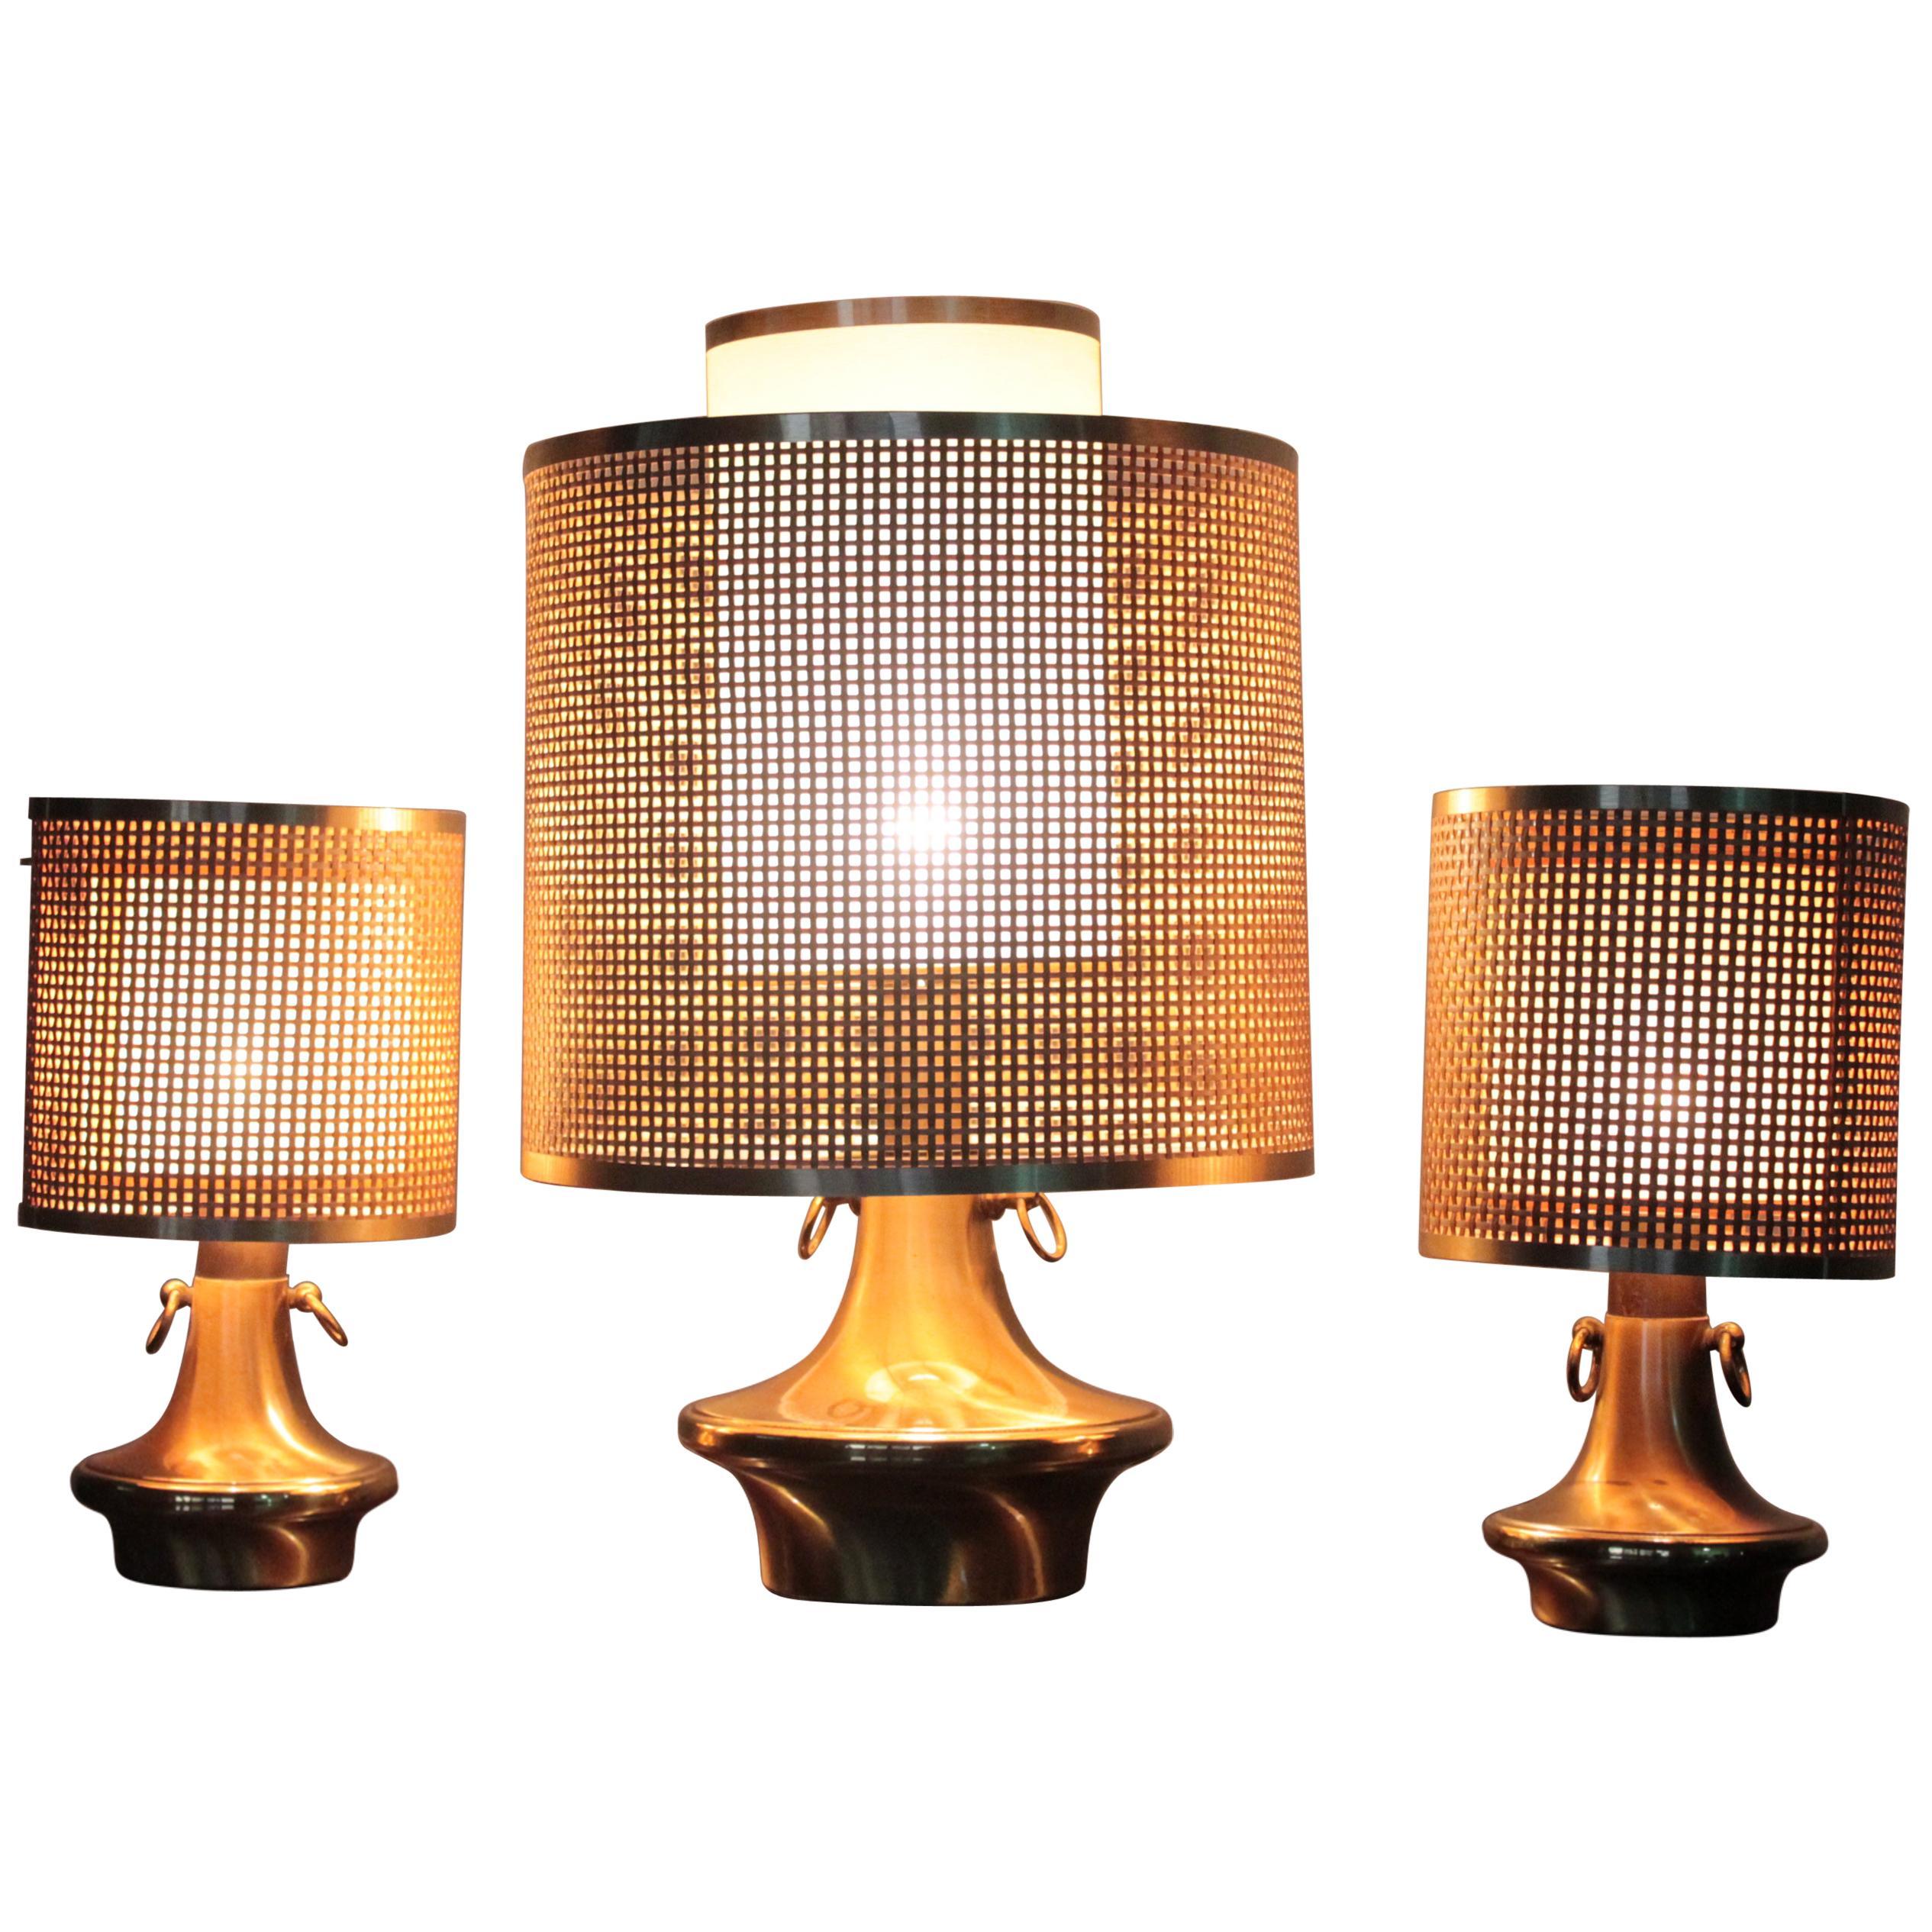 Wicker Lampshade Italian Brass Triptych Table Lamps, 1970s